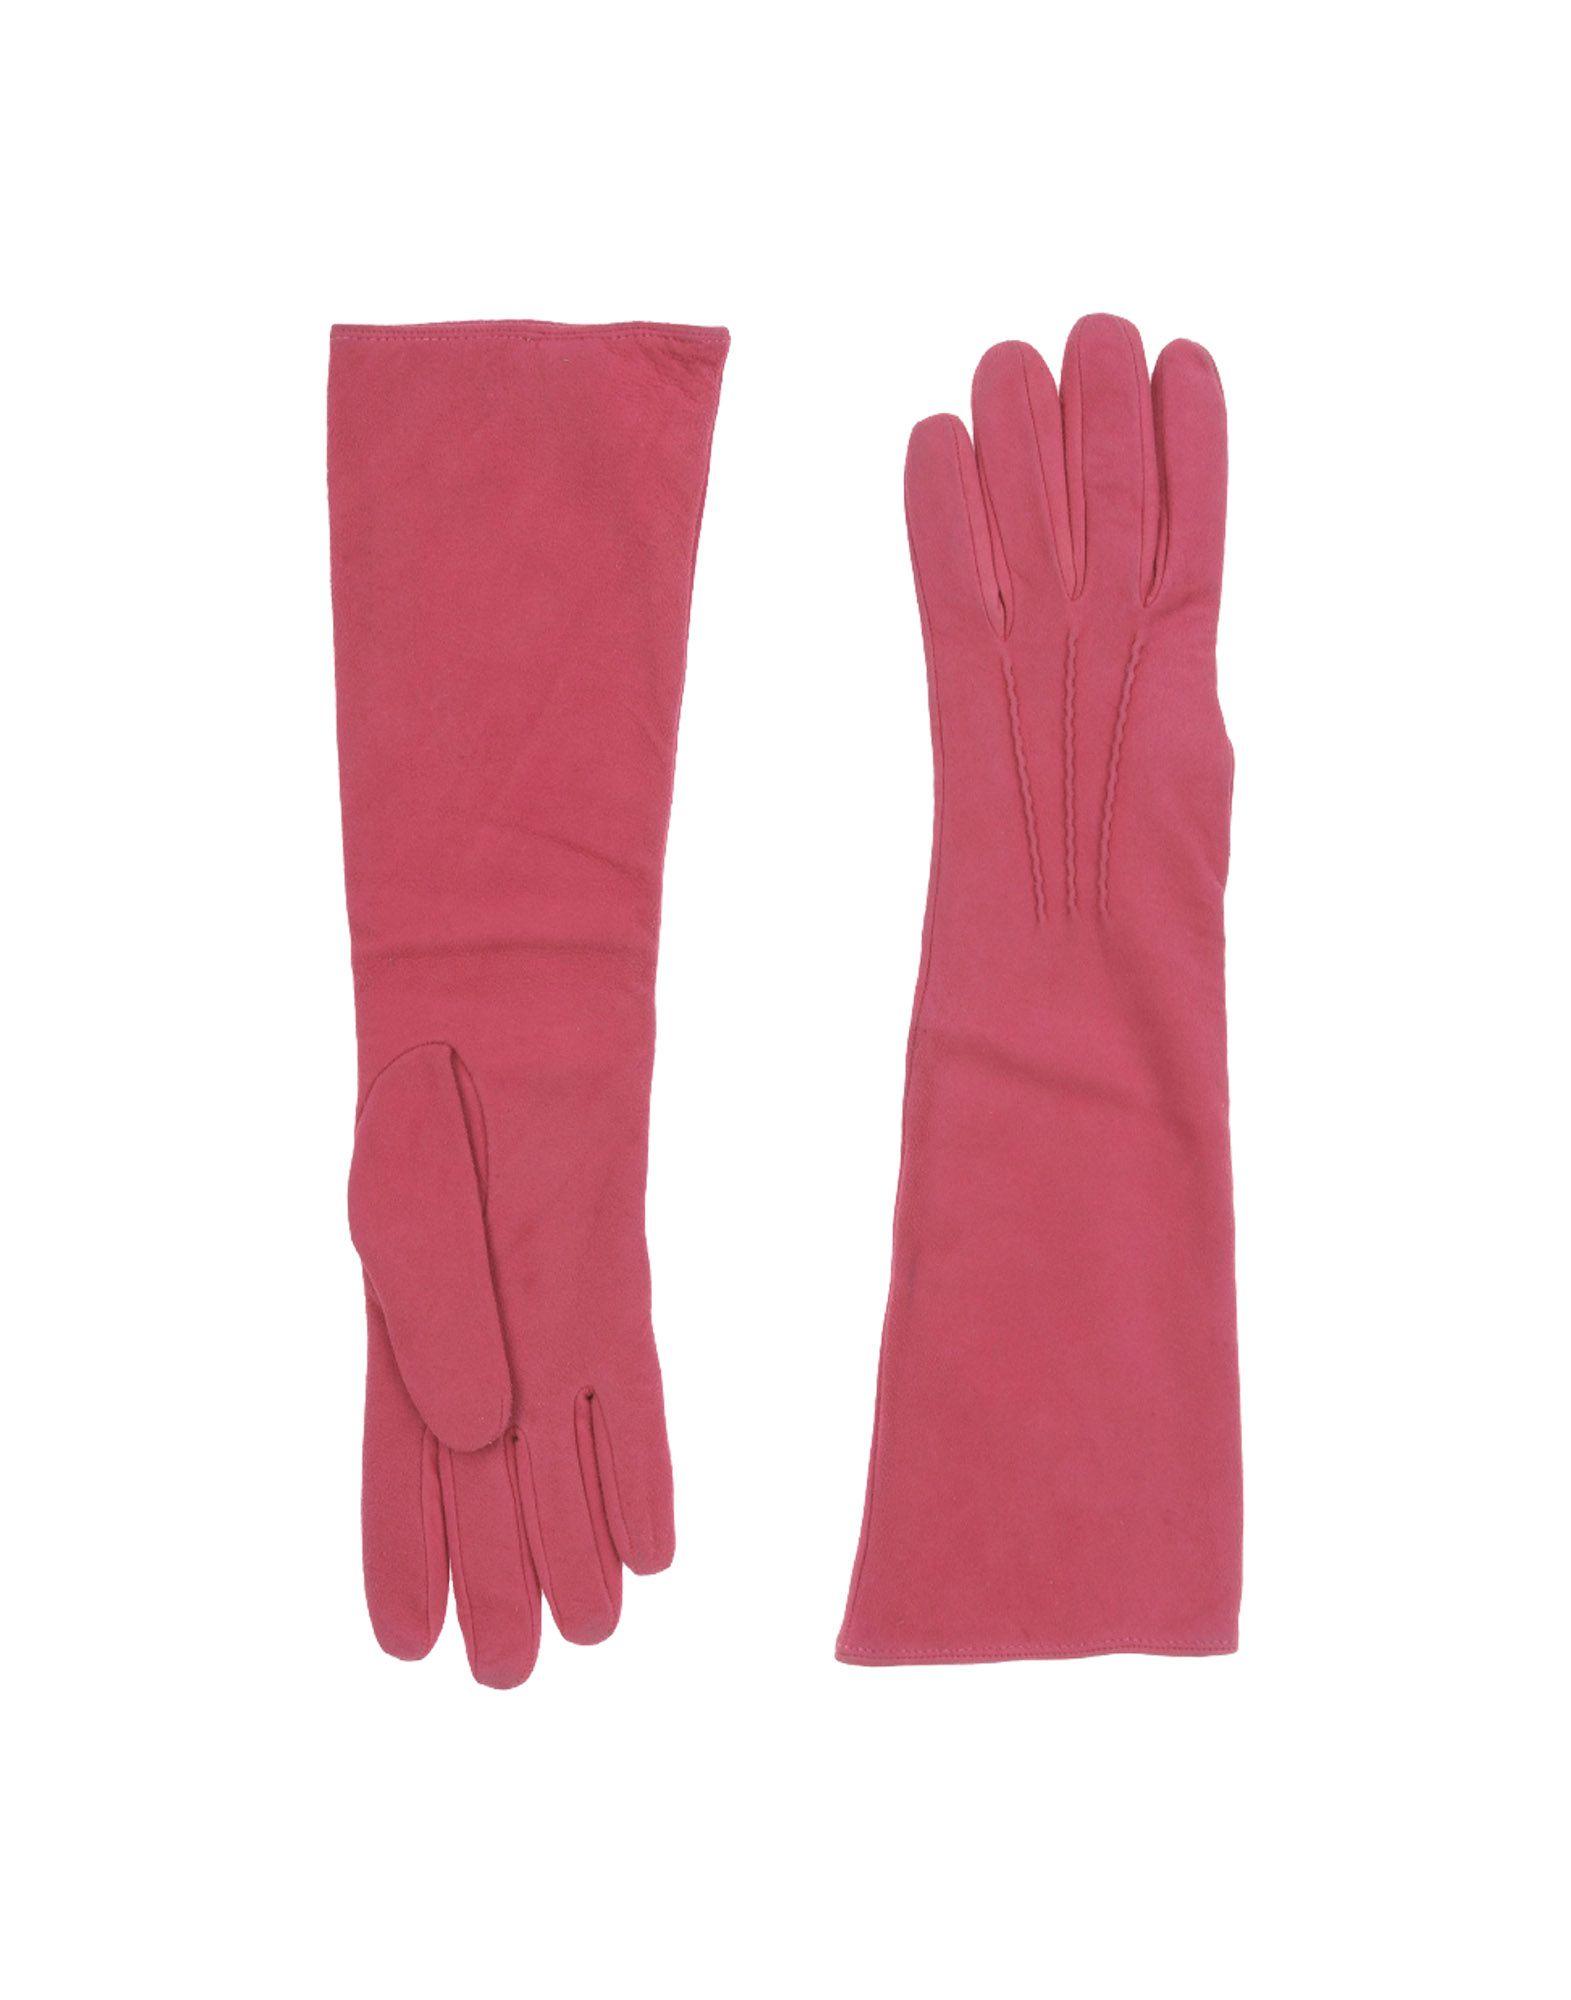 DSQUARED2 Damen Handschuhe Farbe Purpur Größe 3 jetztbilligerkaufen